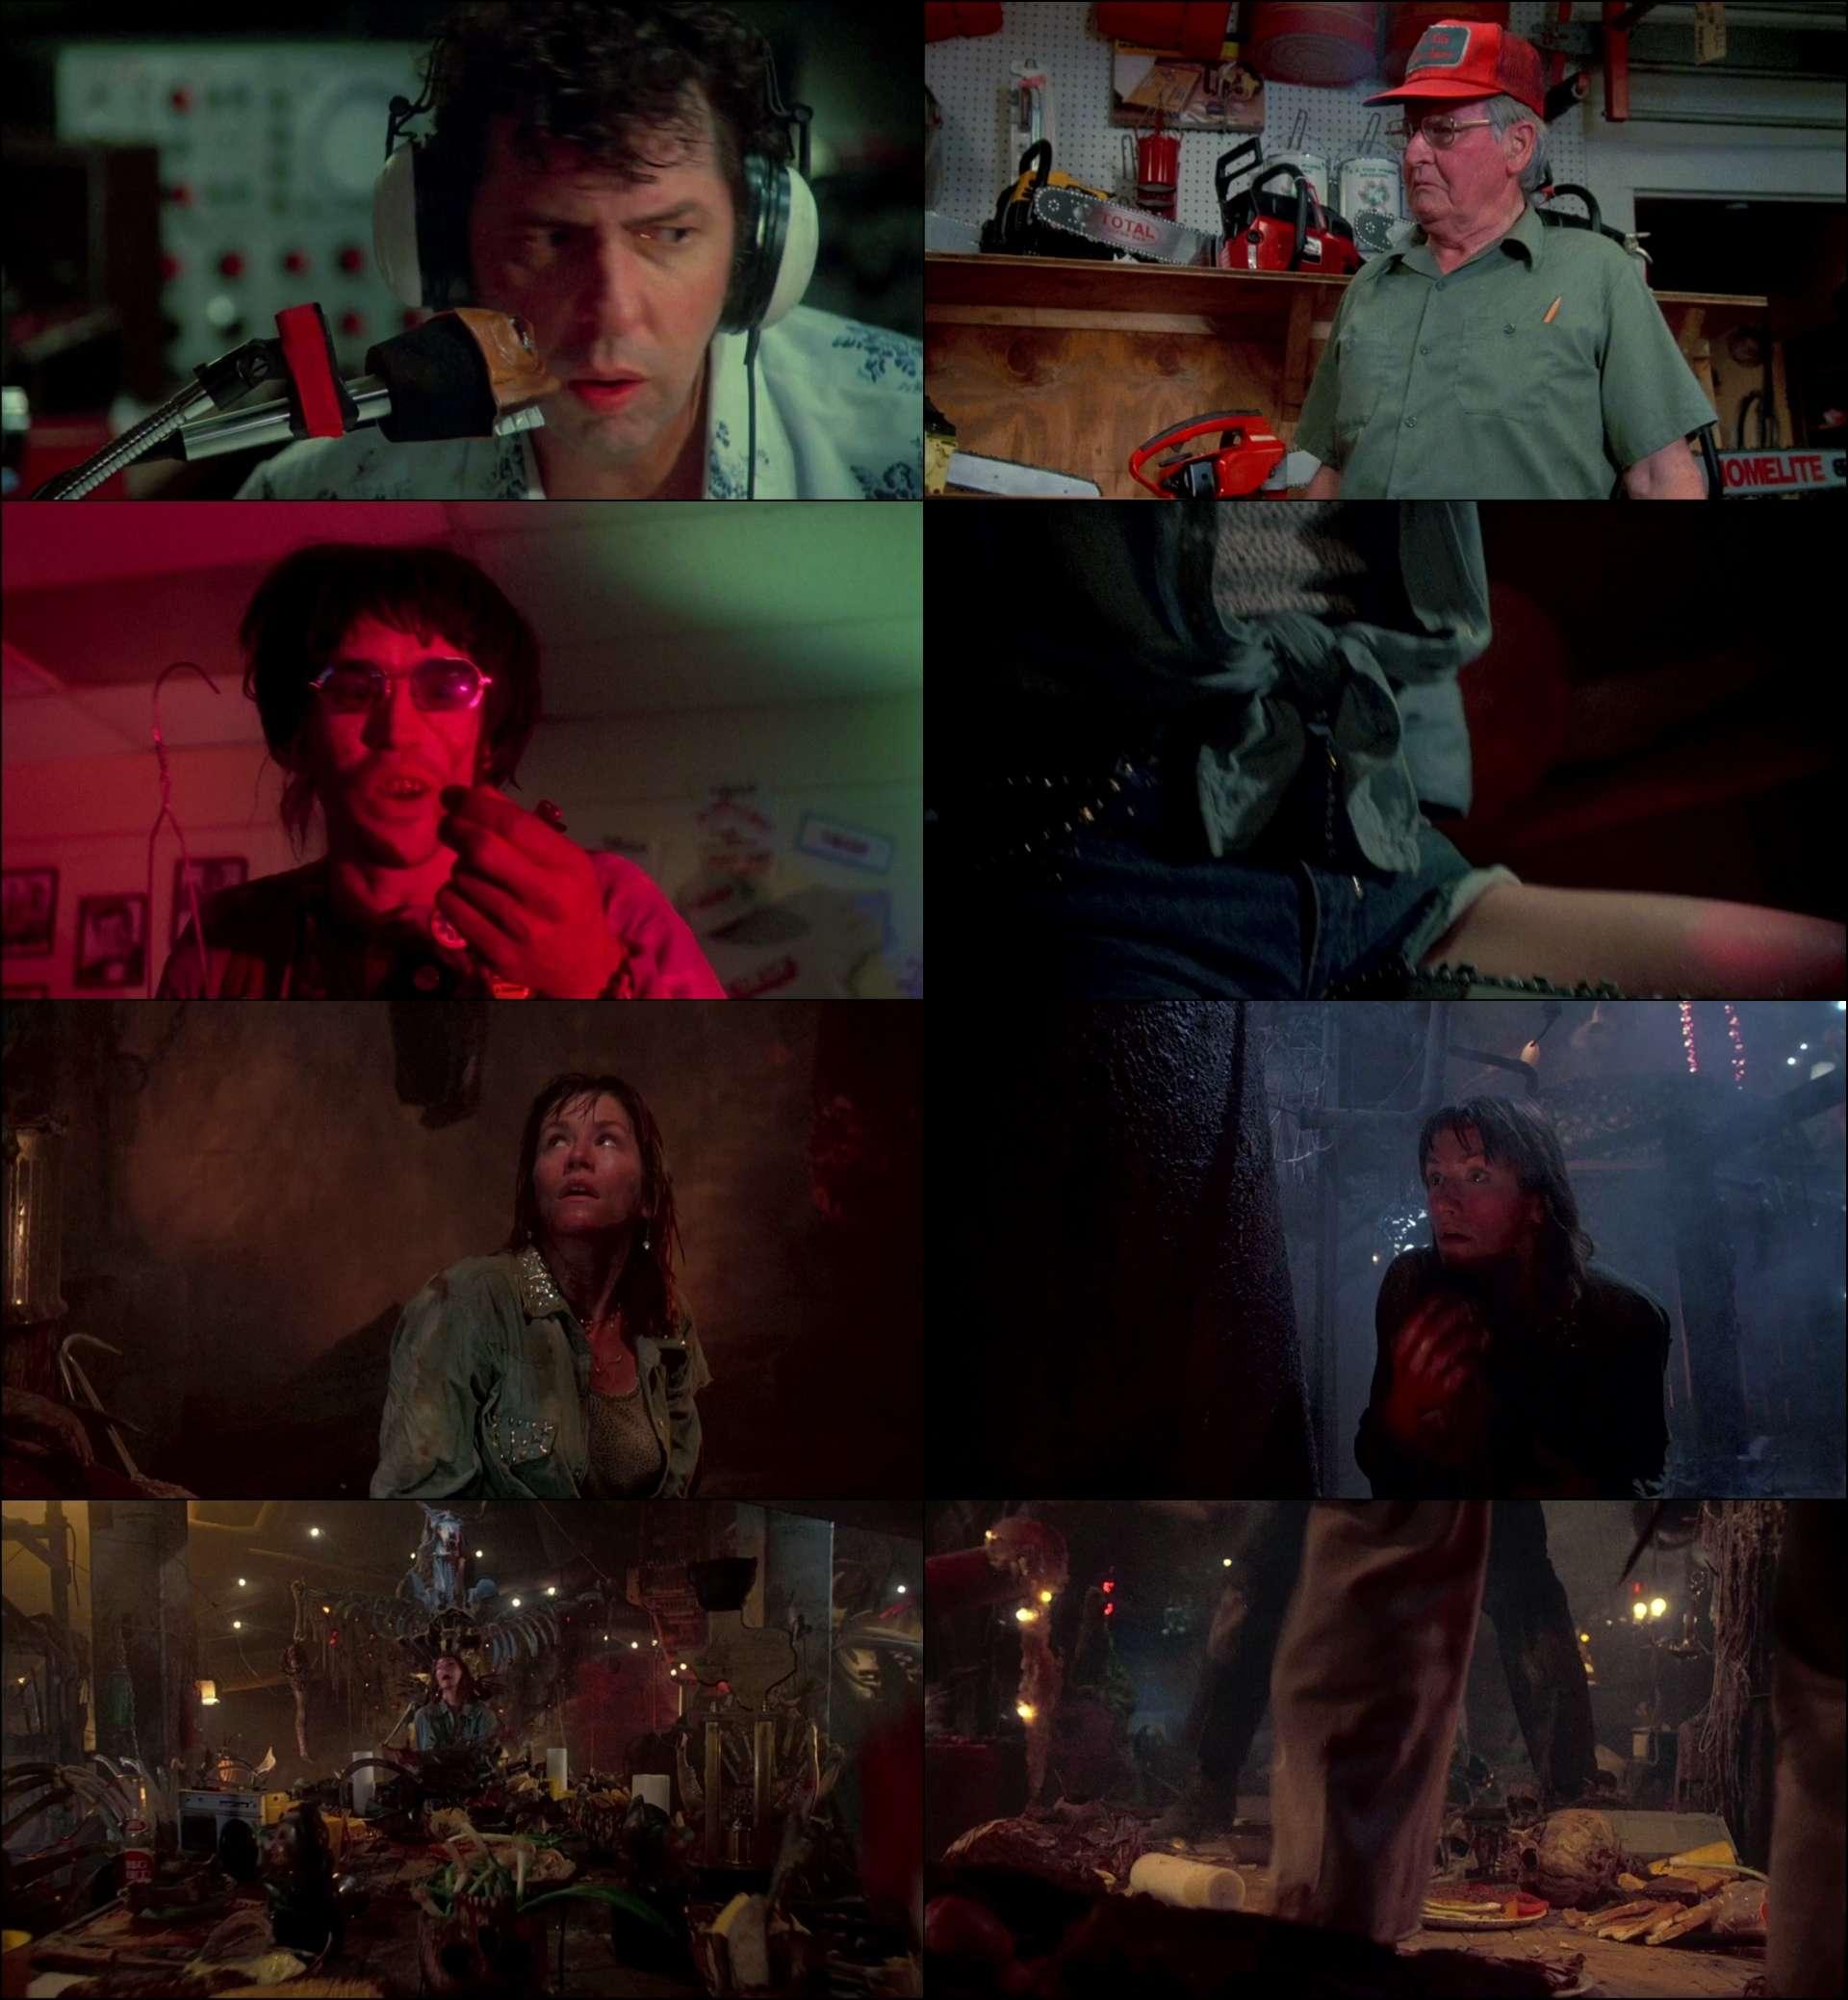 The Texas Chainsaw Massacre 2 - Teksas Katliamı 2 (1986) türkçe dublaj film indir